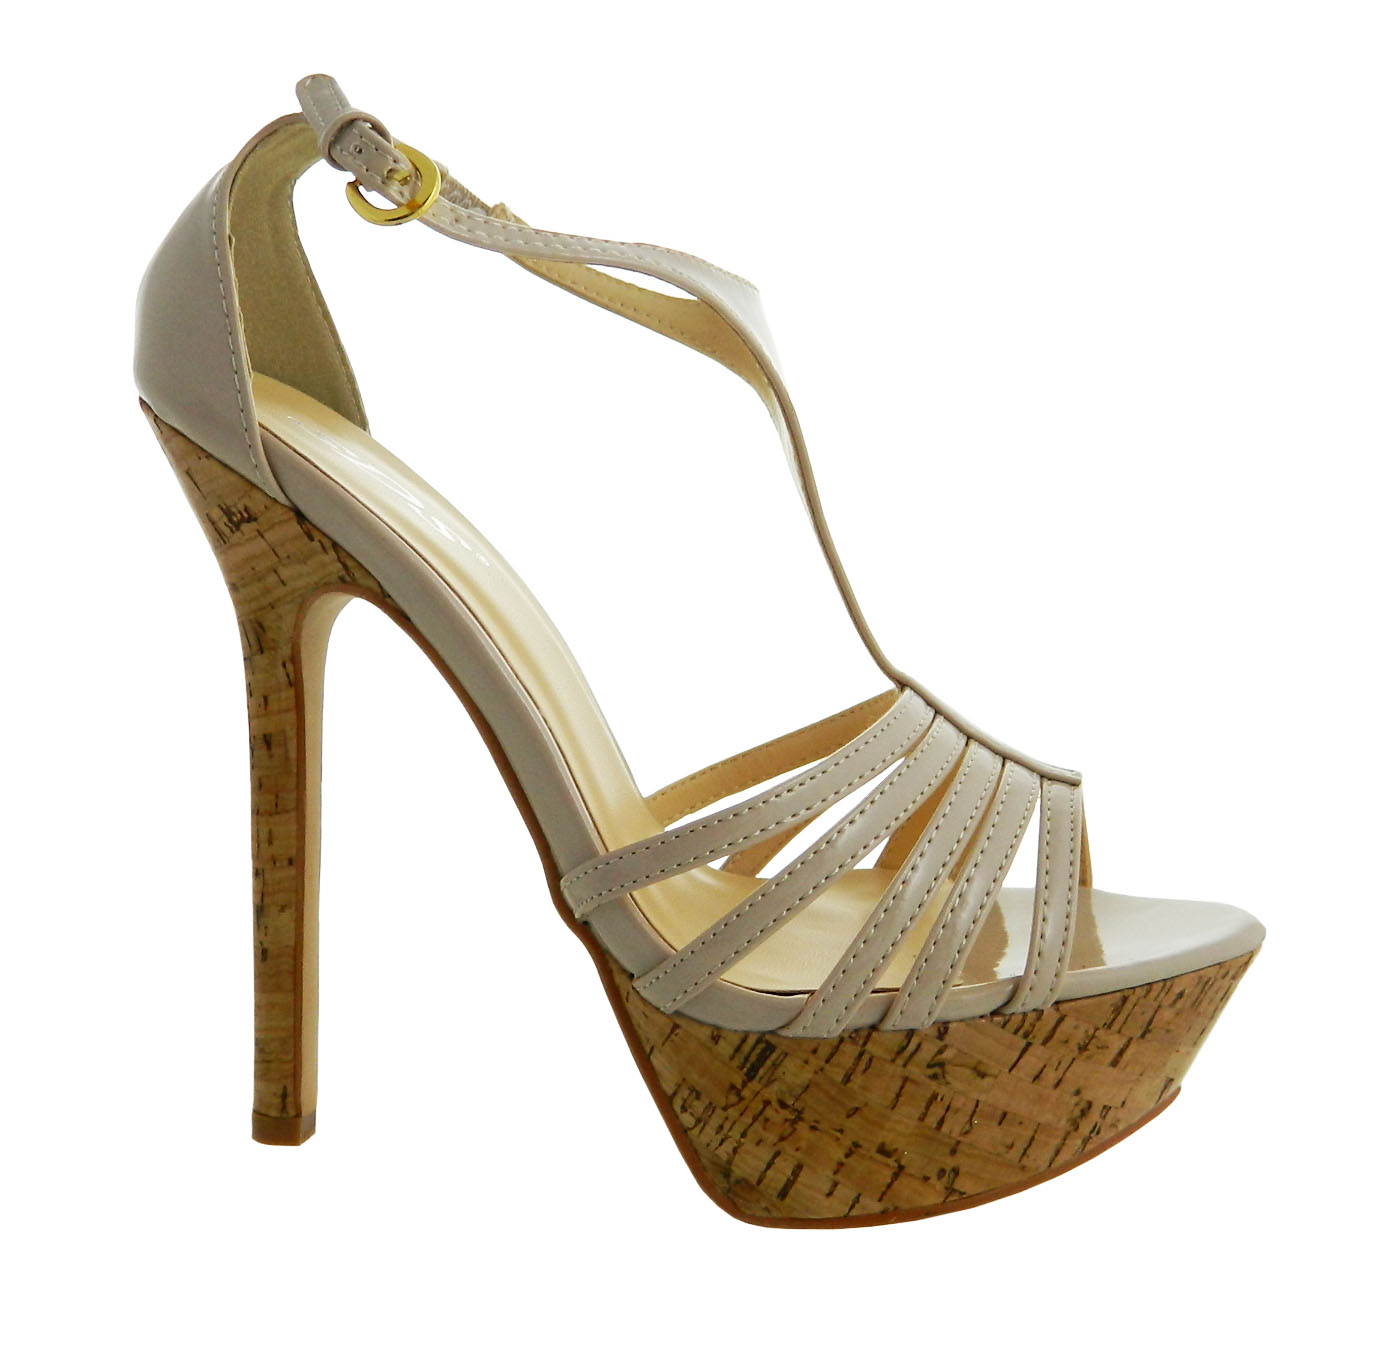 73674b3cbe78 Dámske sandále Peep Toe 6205-GL